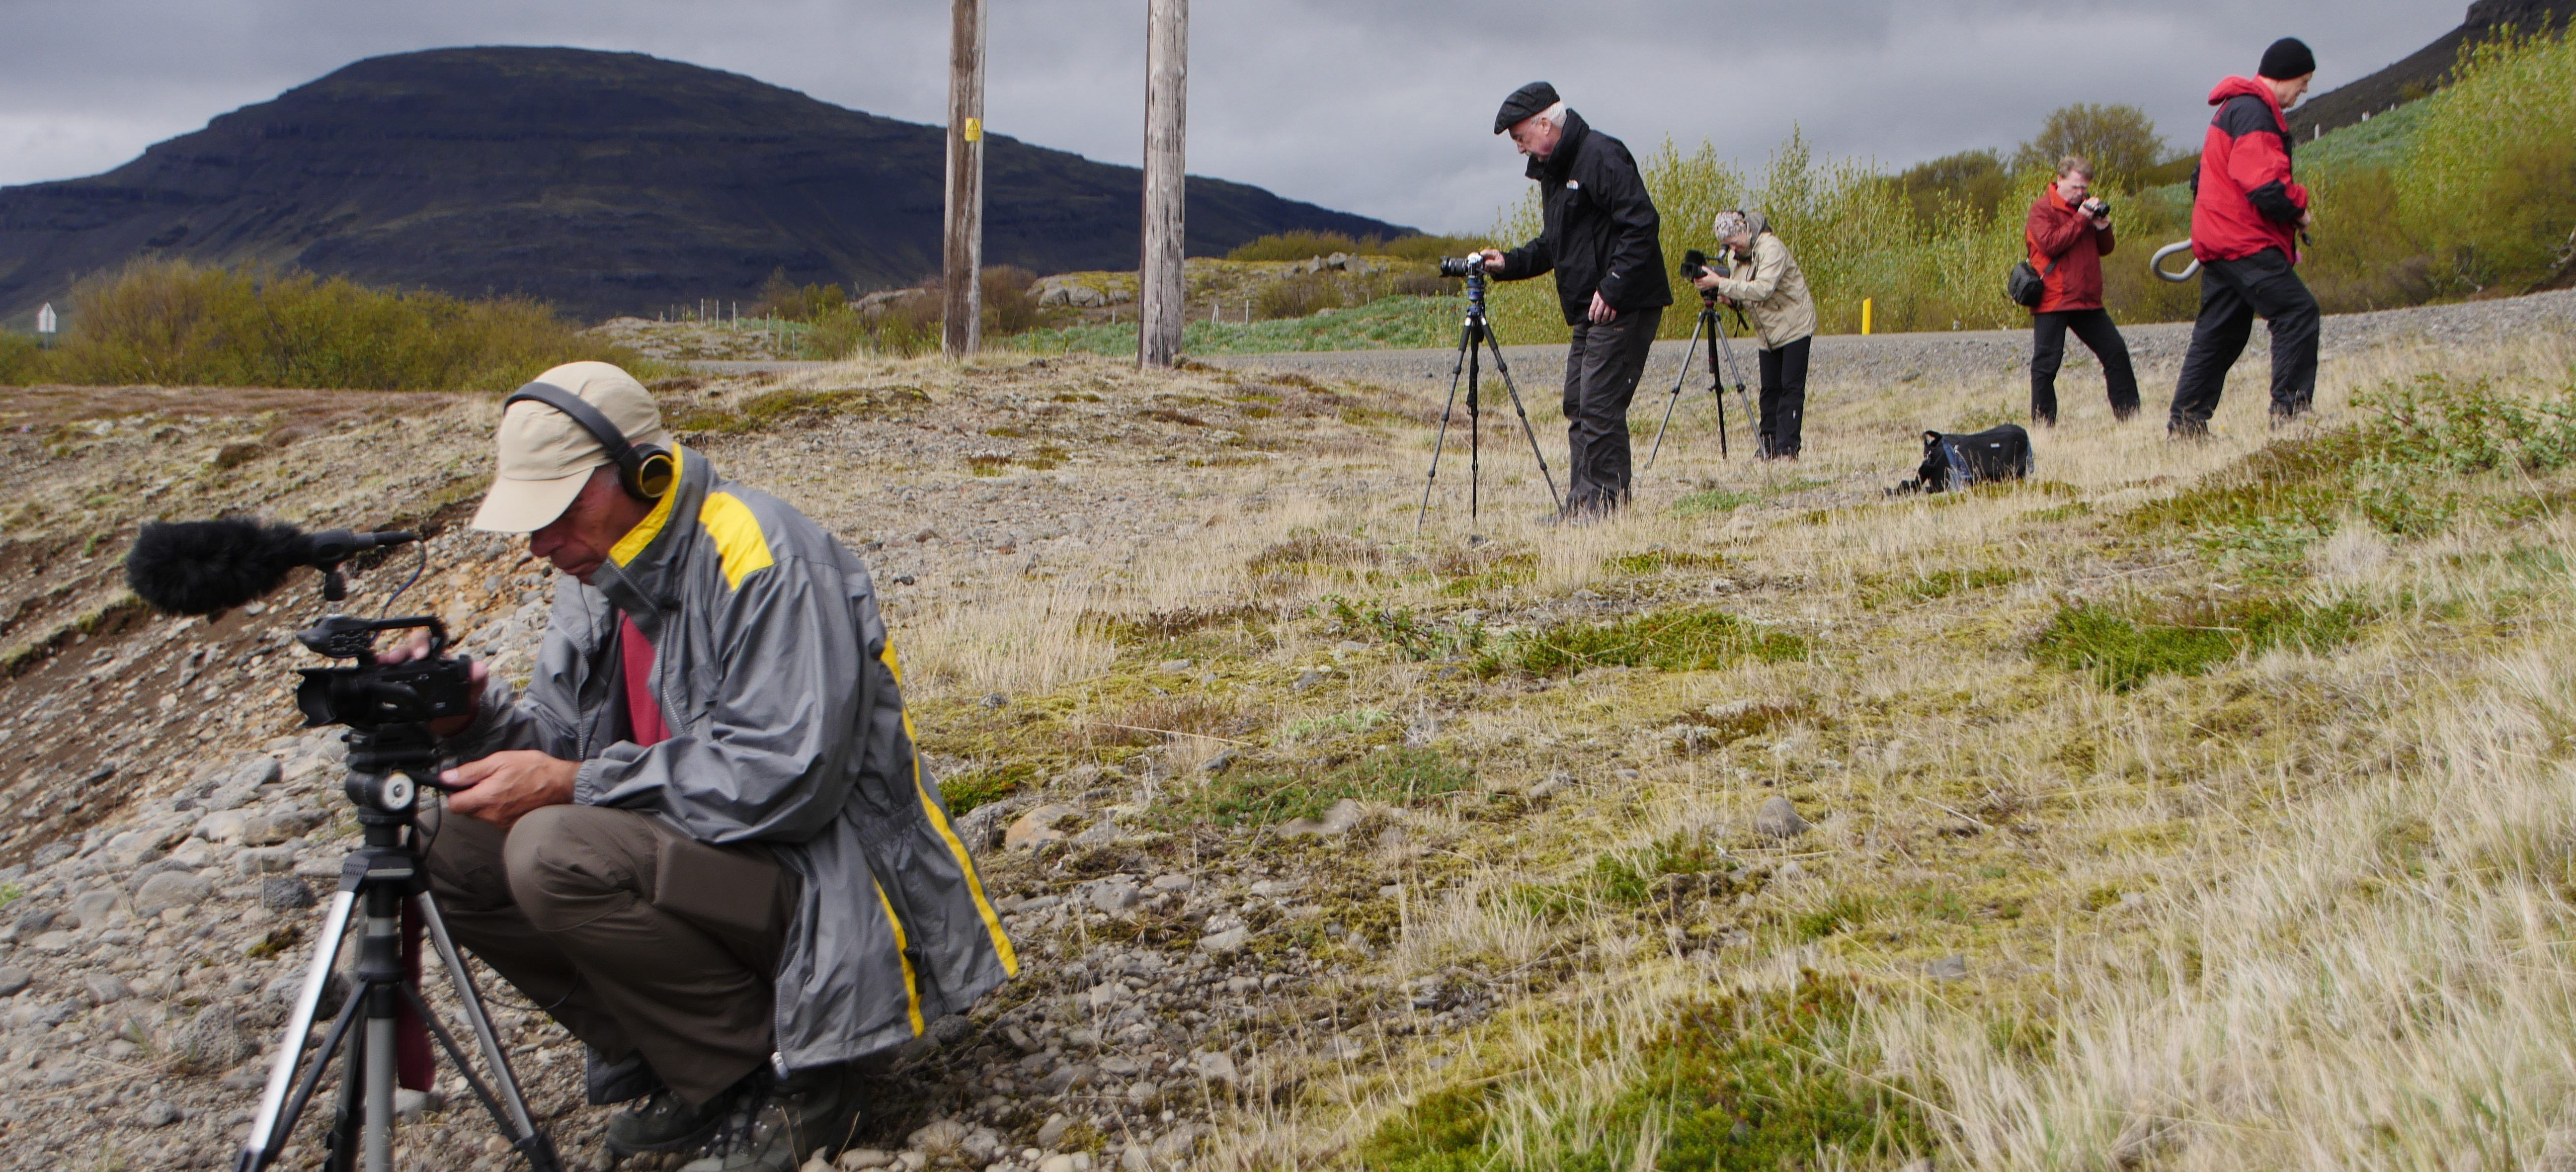 island-filmreise-teilnehmer-workshop-kungel-panorama